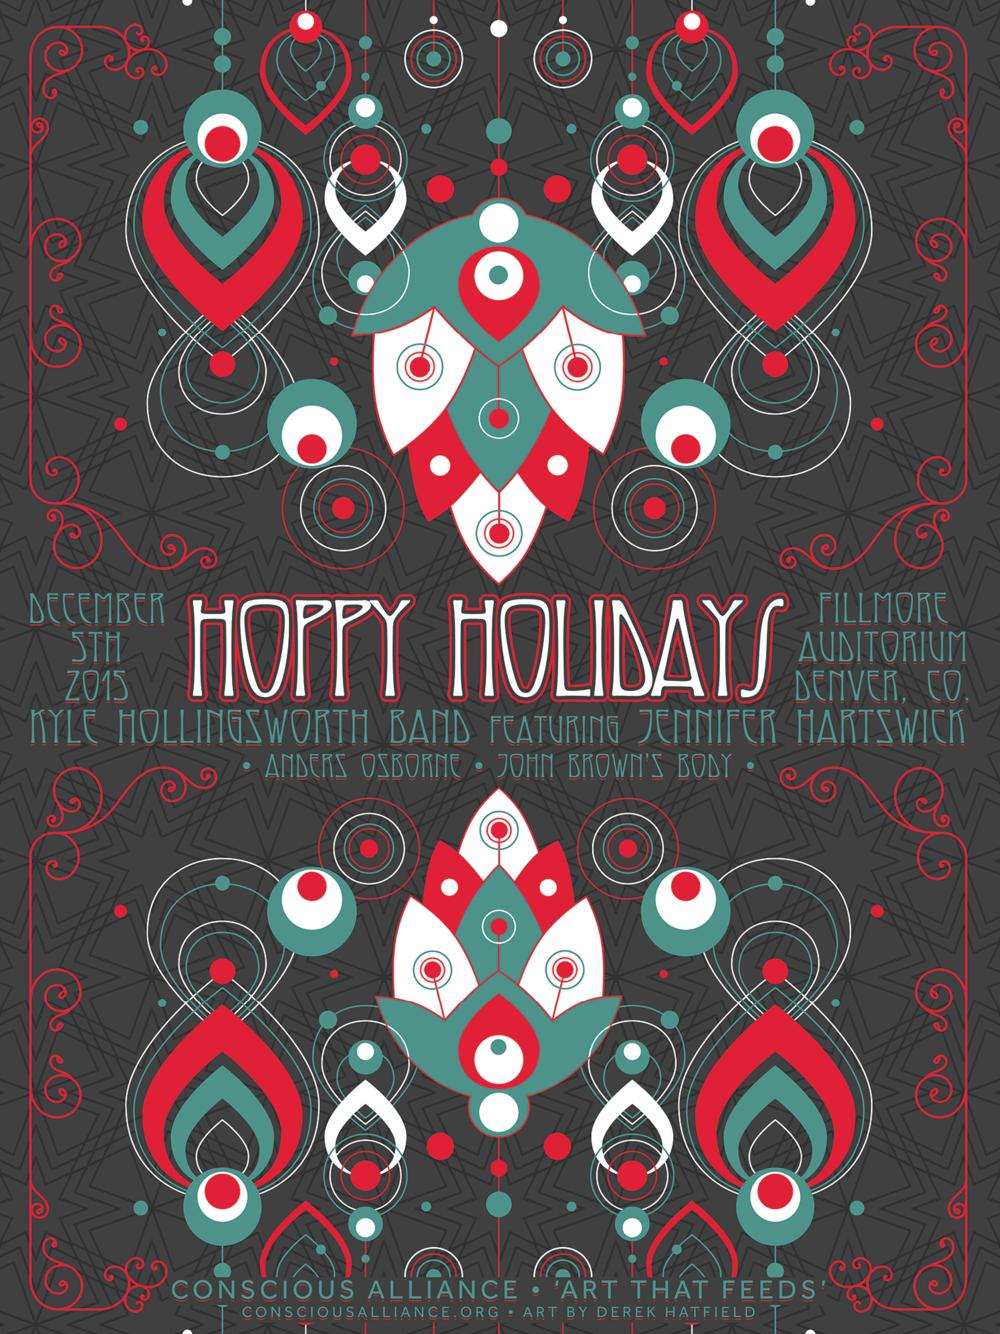 Hoppy Holidays - 12.5.2015